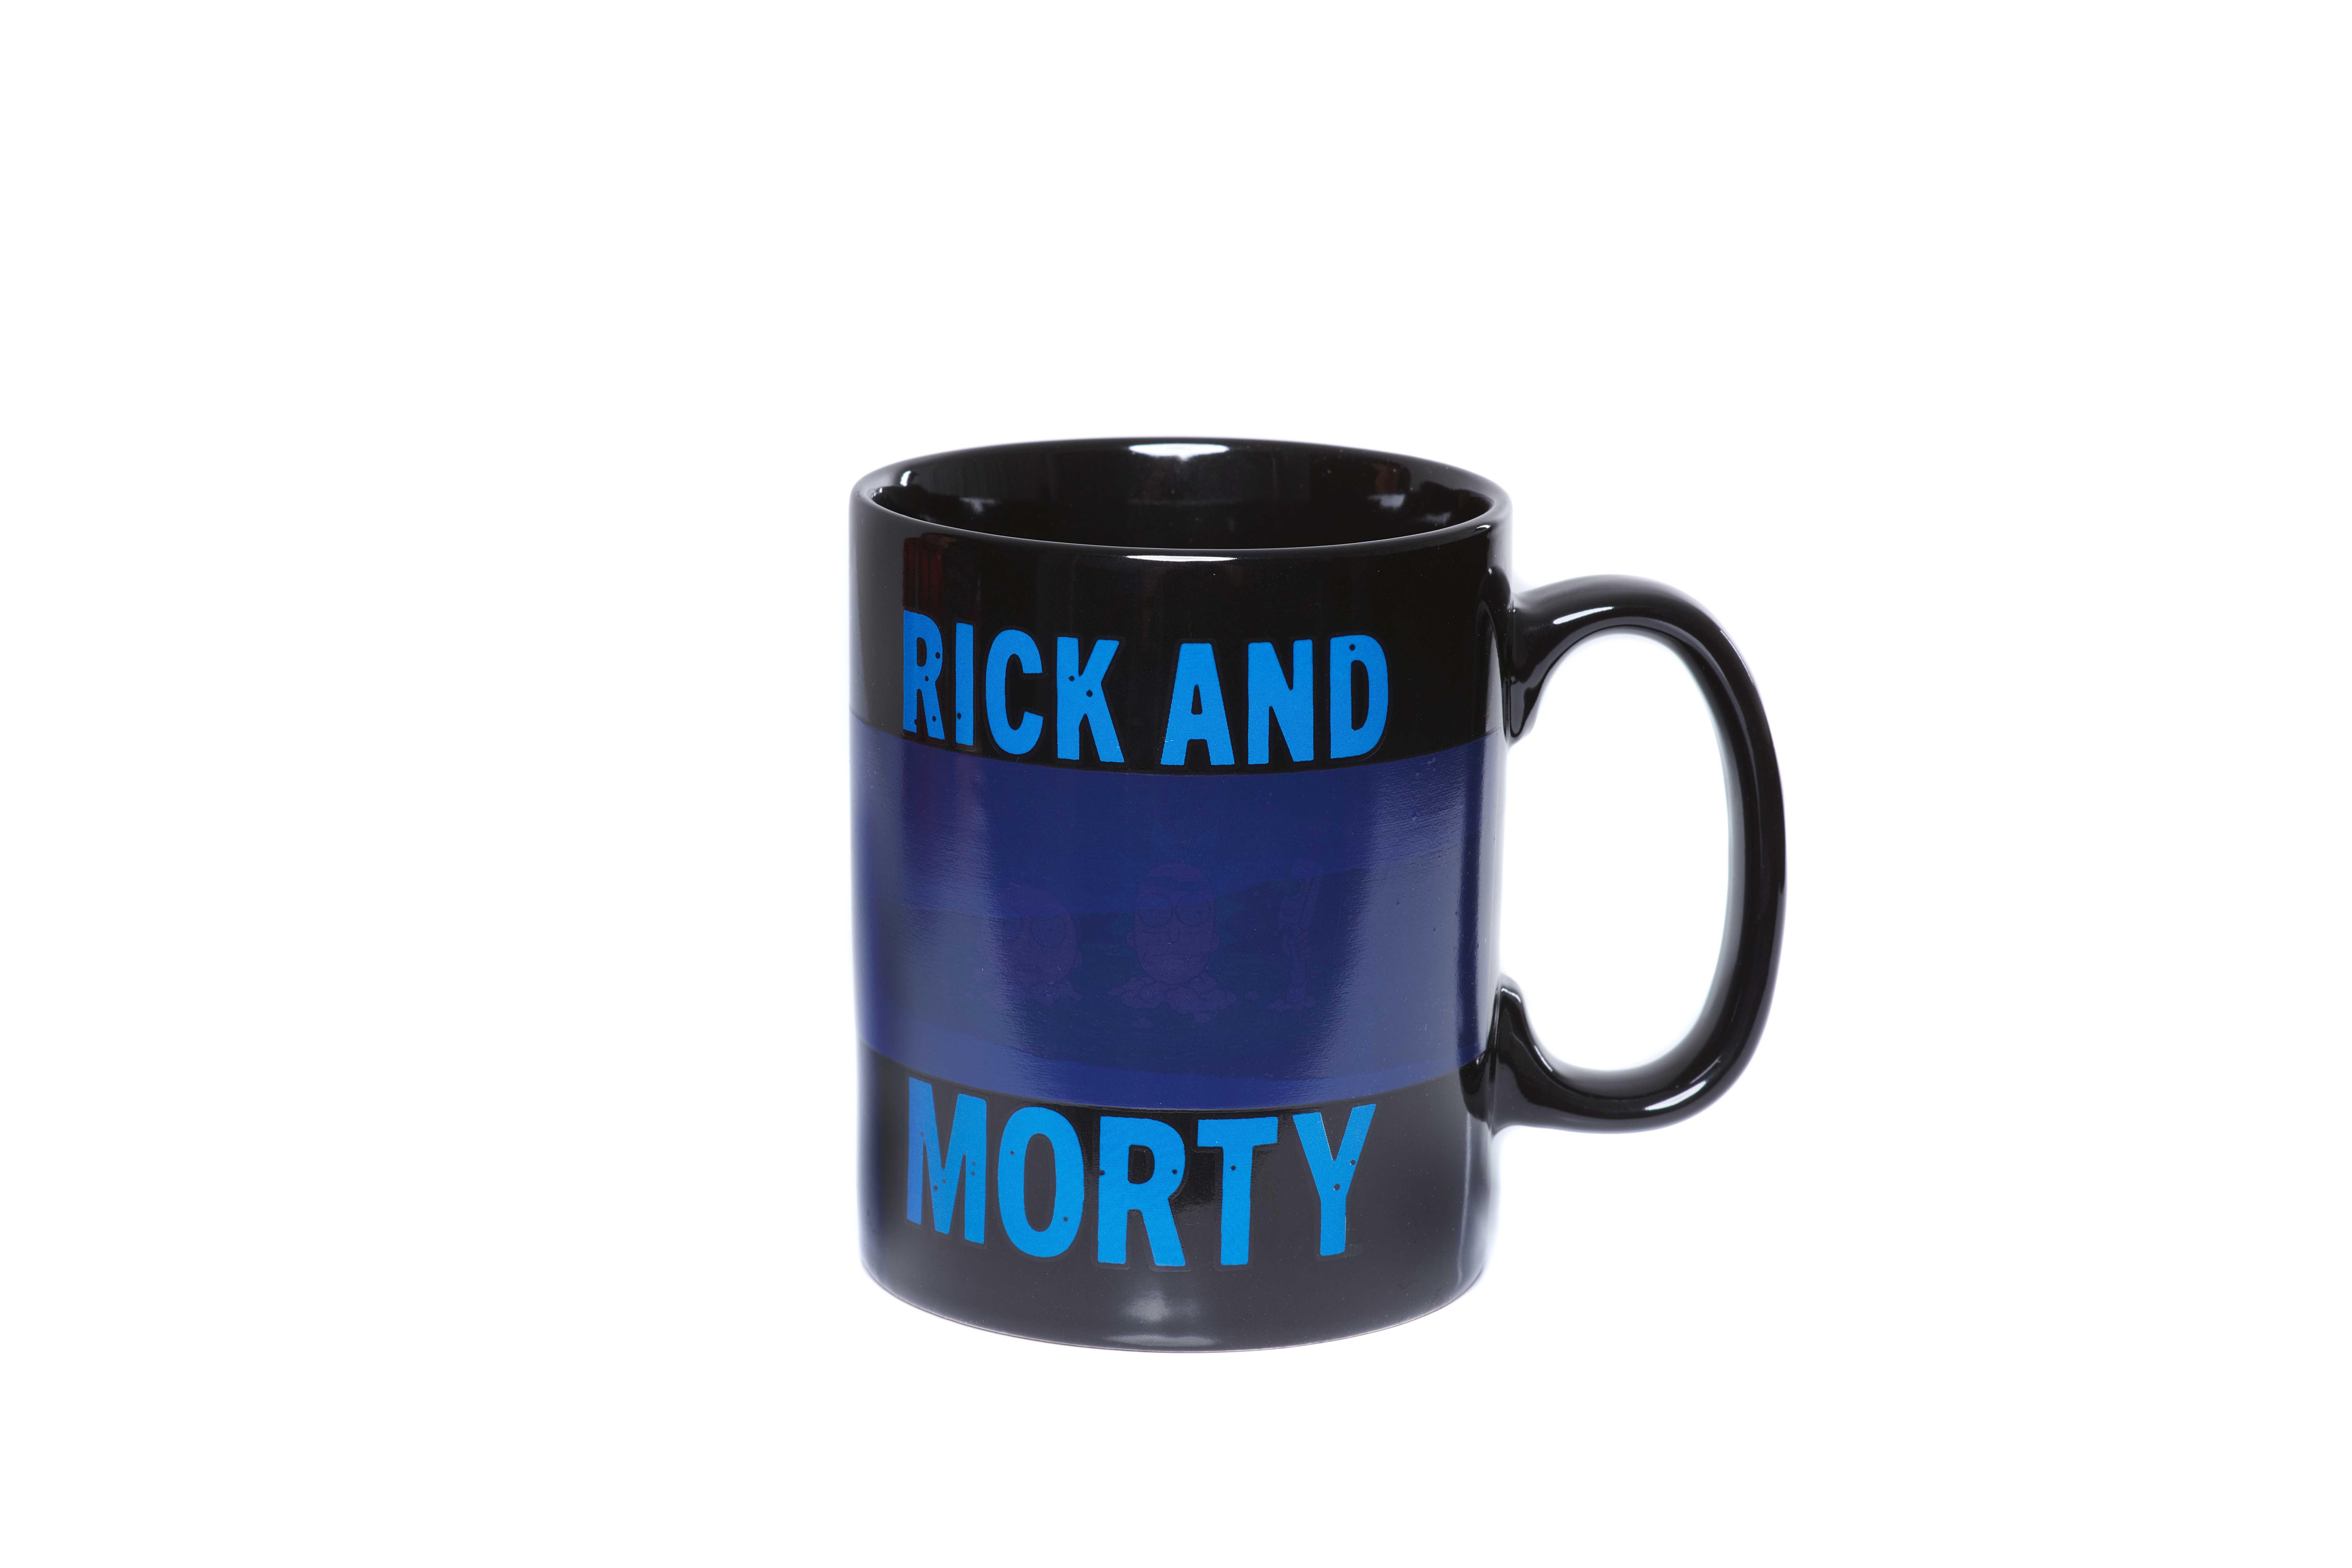 Rick and Morty kube termoaktywny